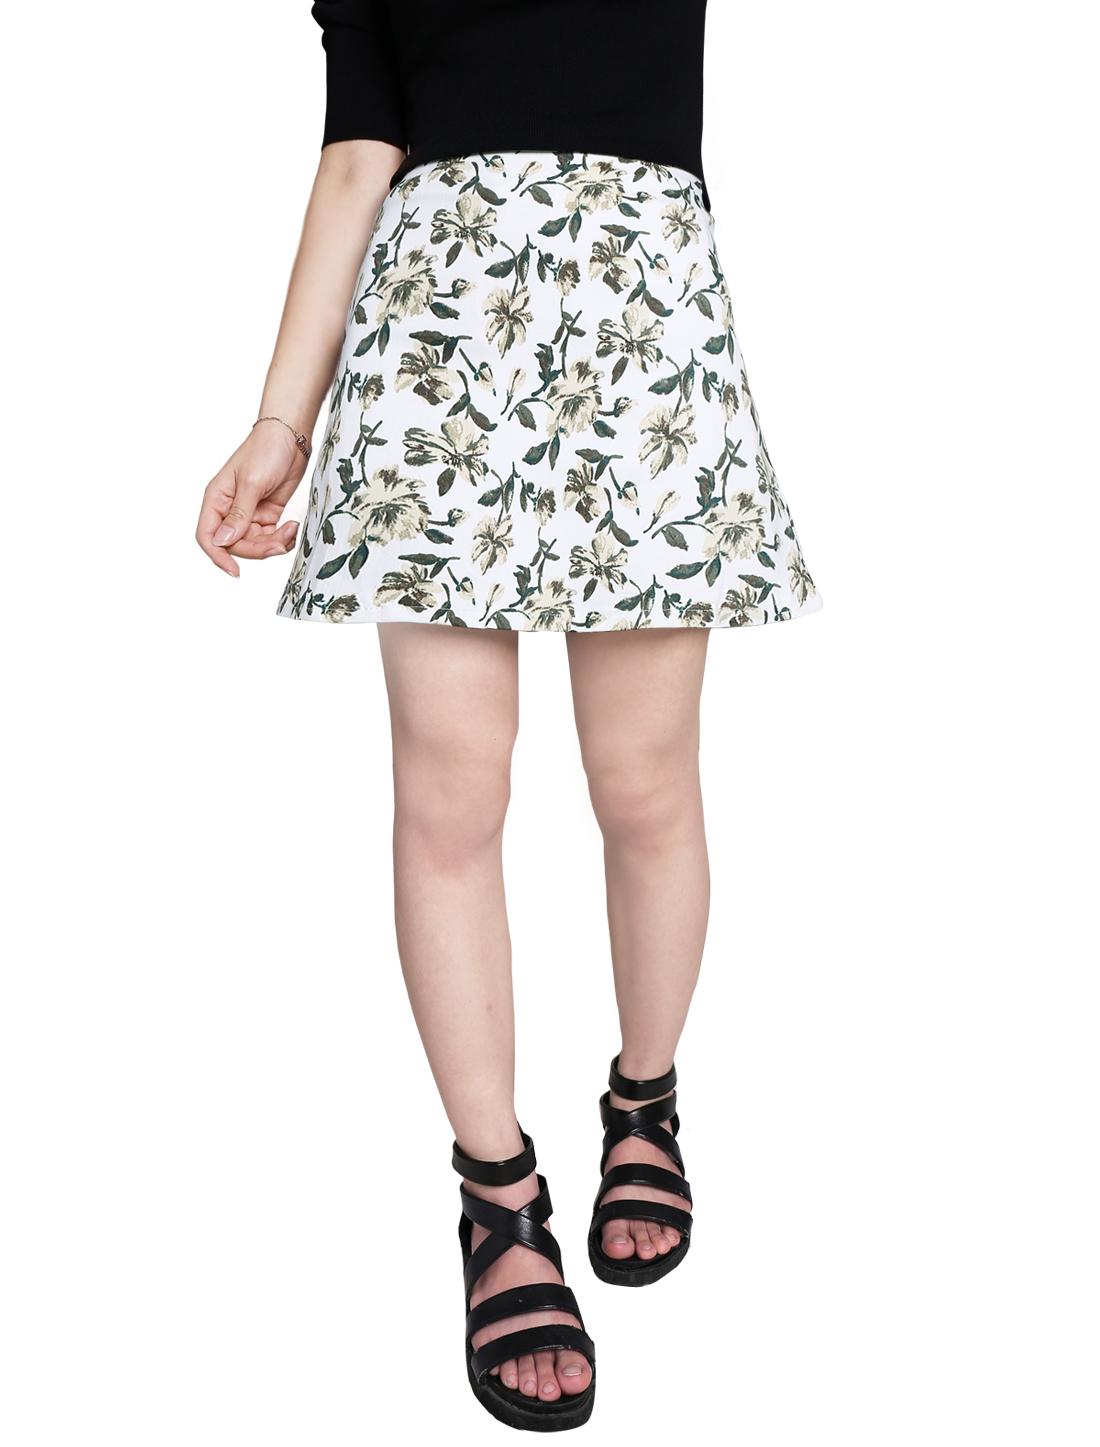 Women Elastic Waist Zip Closure Floral Prints A-Line Skirts White S